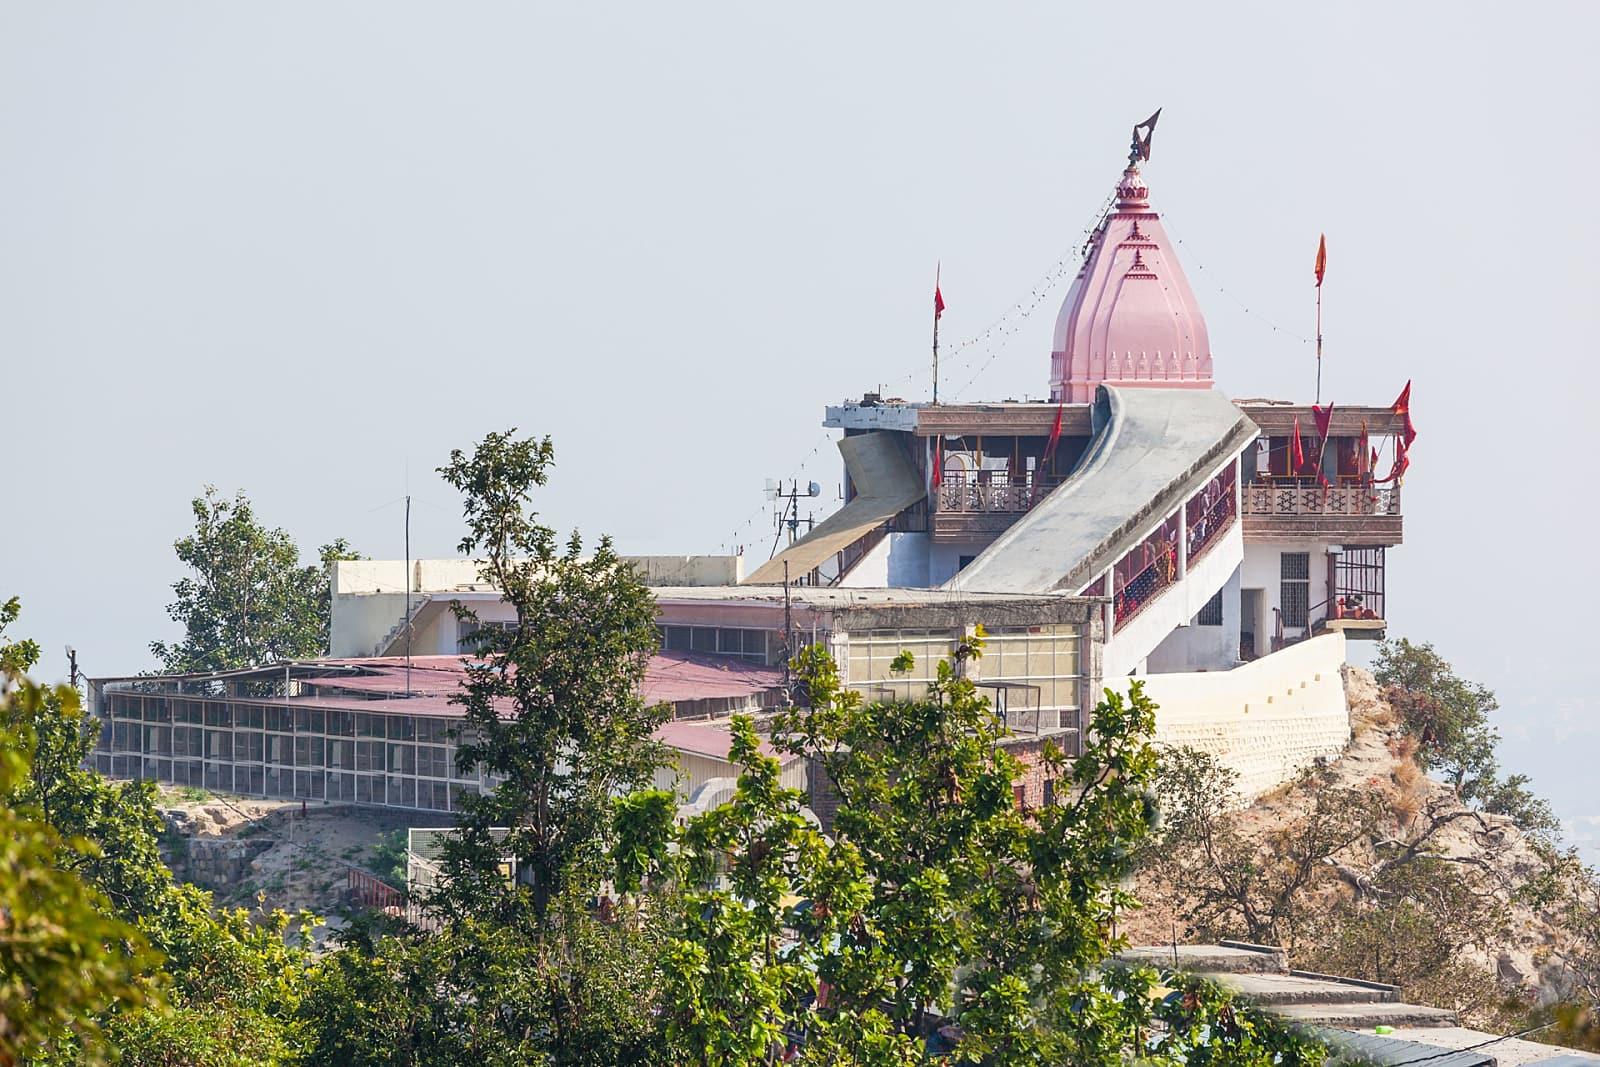 Chandi-Devi-Haridwar Haridwar en Uttarakhand: Guía esencial de viaje